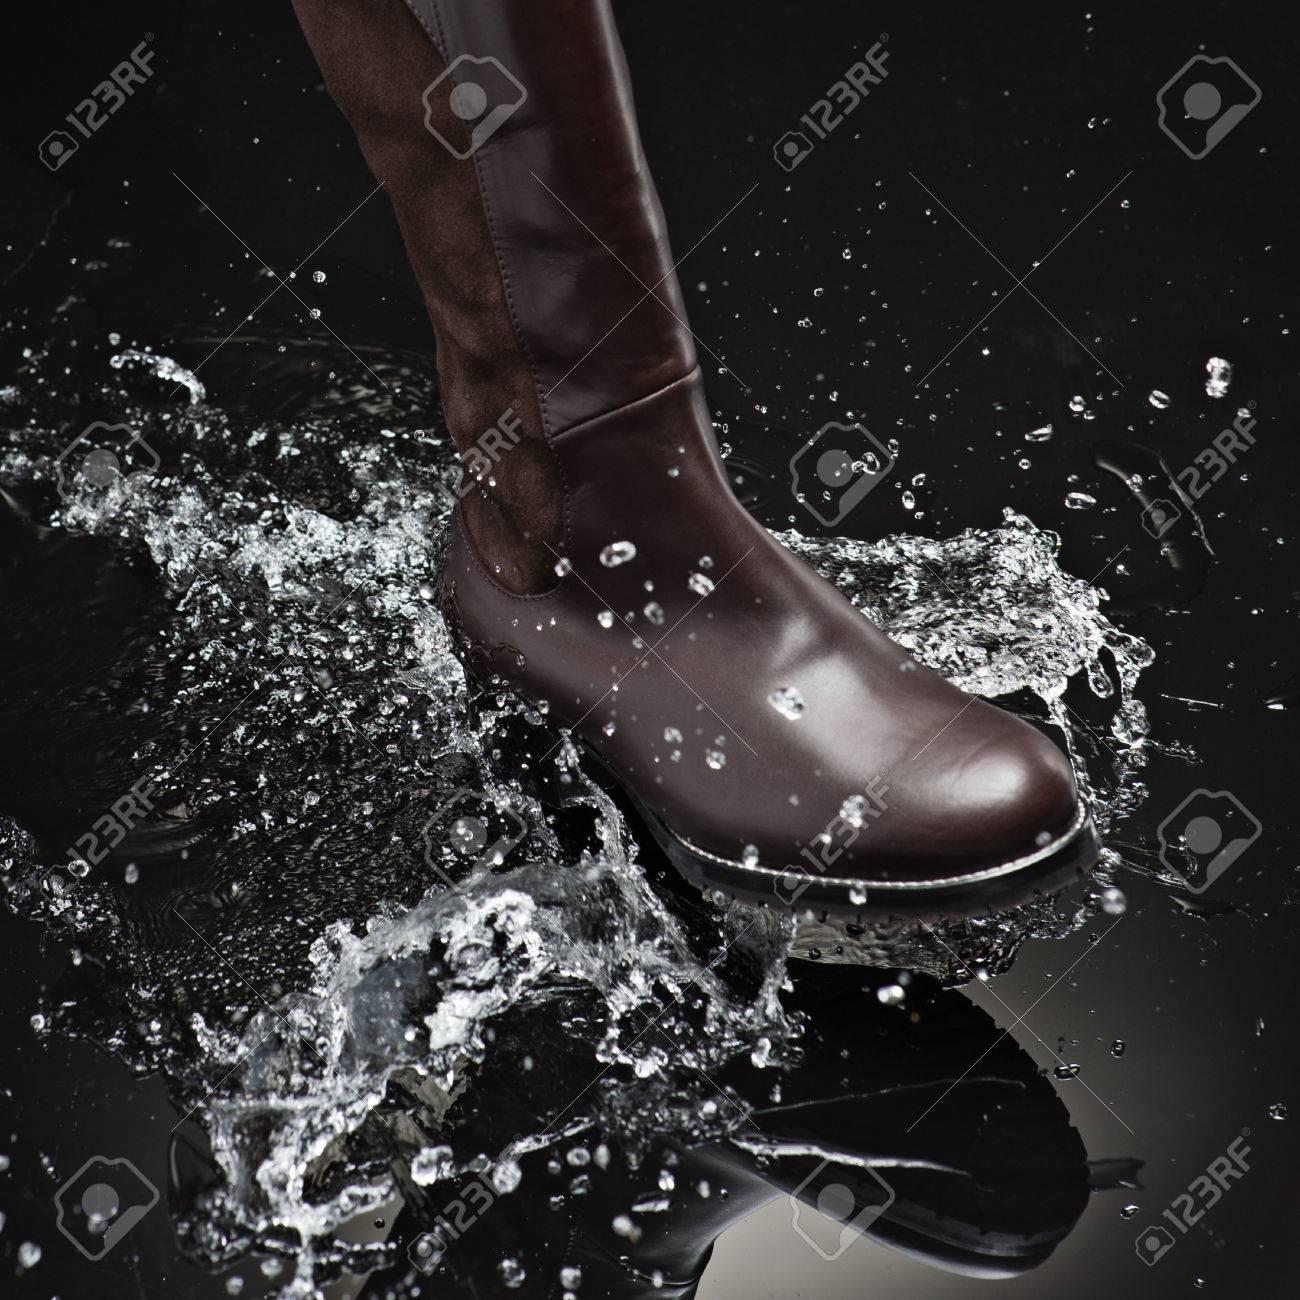 brown leather female boot splashing water - 31032507